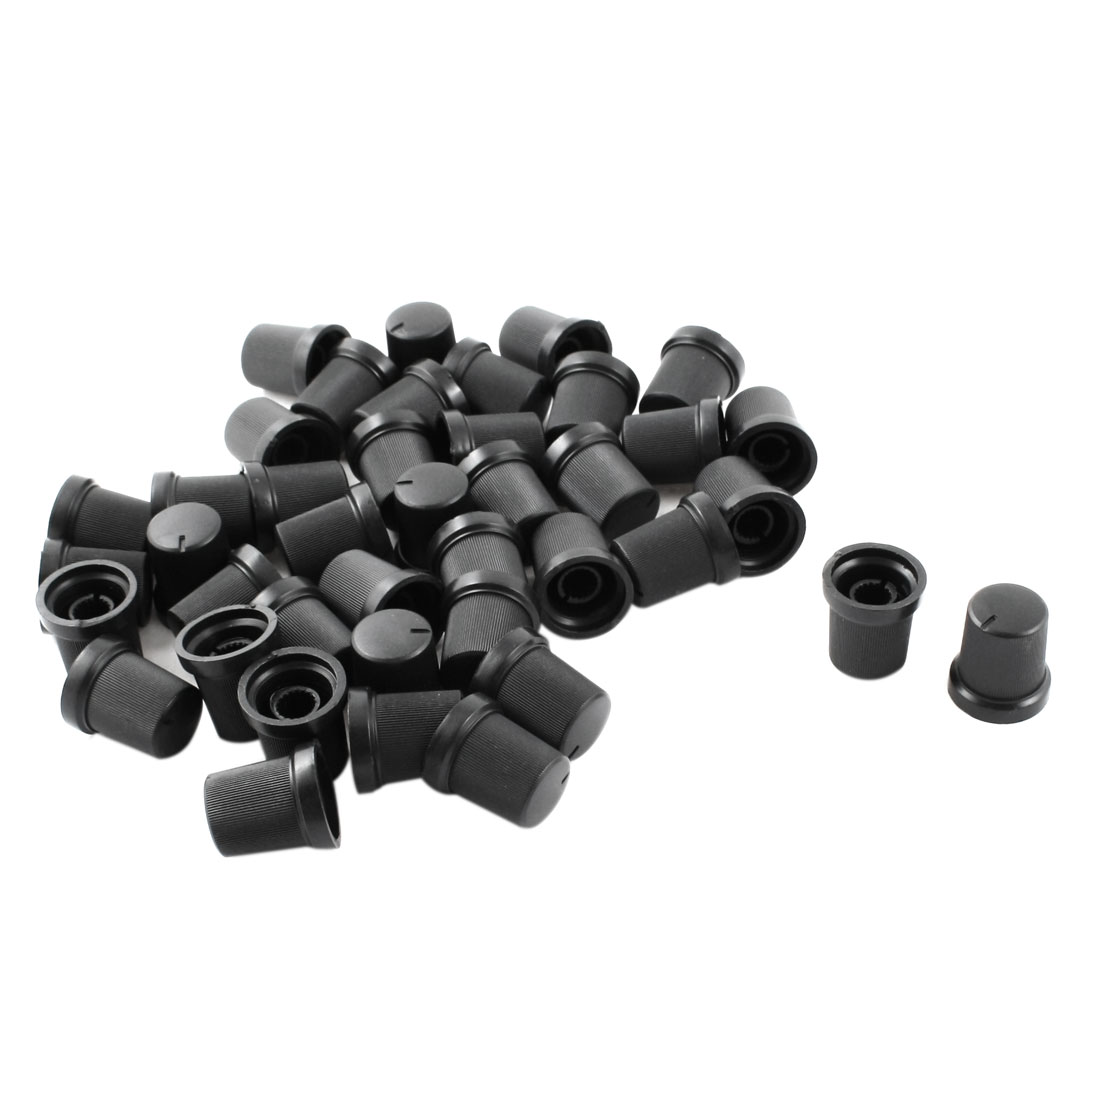 40pcs 6mm Knurled Shaft Black Top Taper Volume Knob Cap for Potentiometer Pot